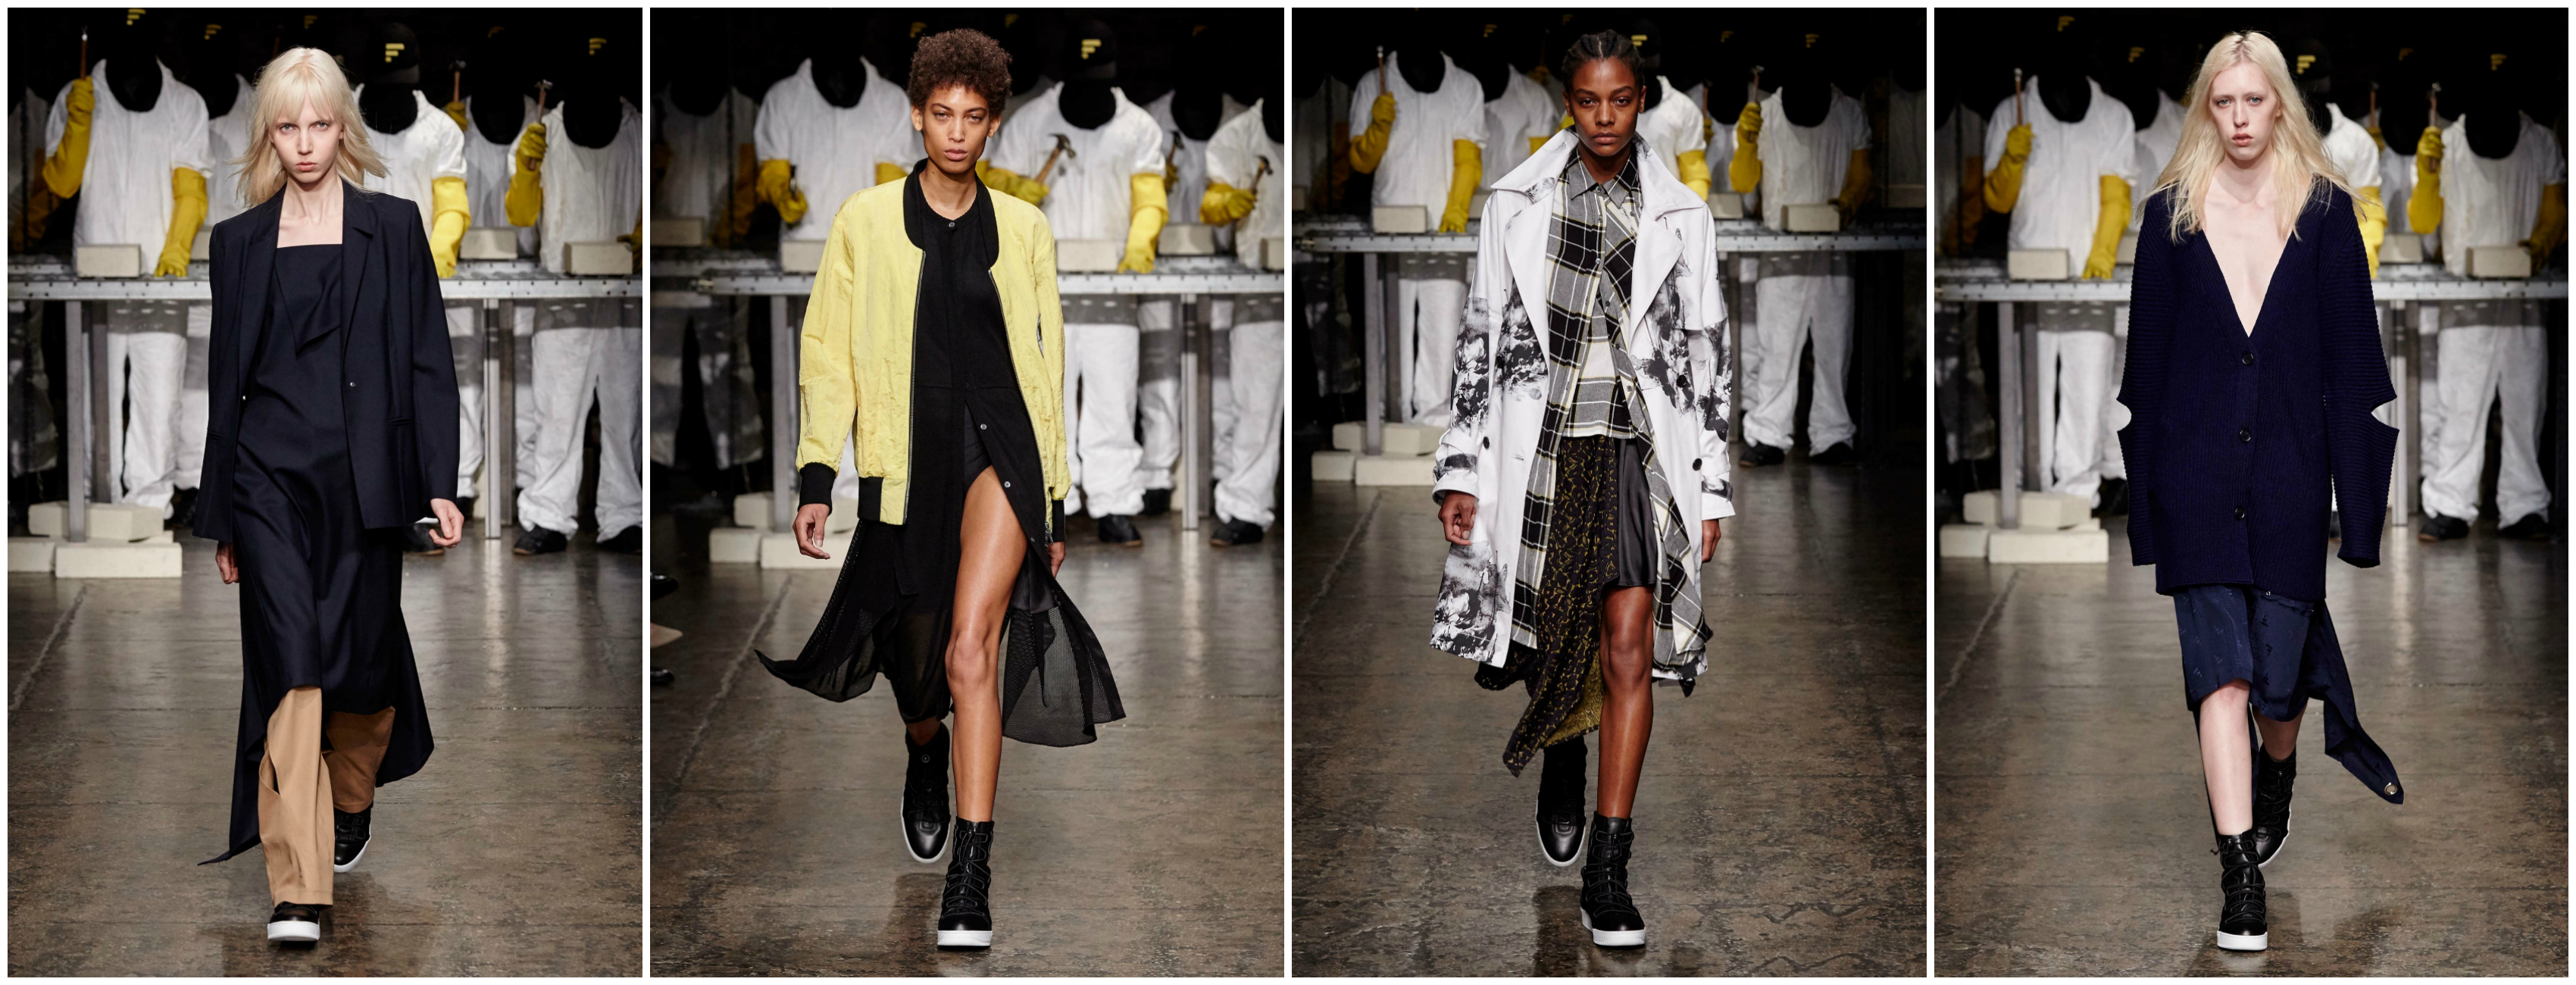 new york fashion week styling id couture public school 2016